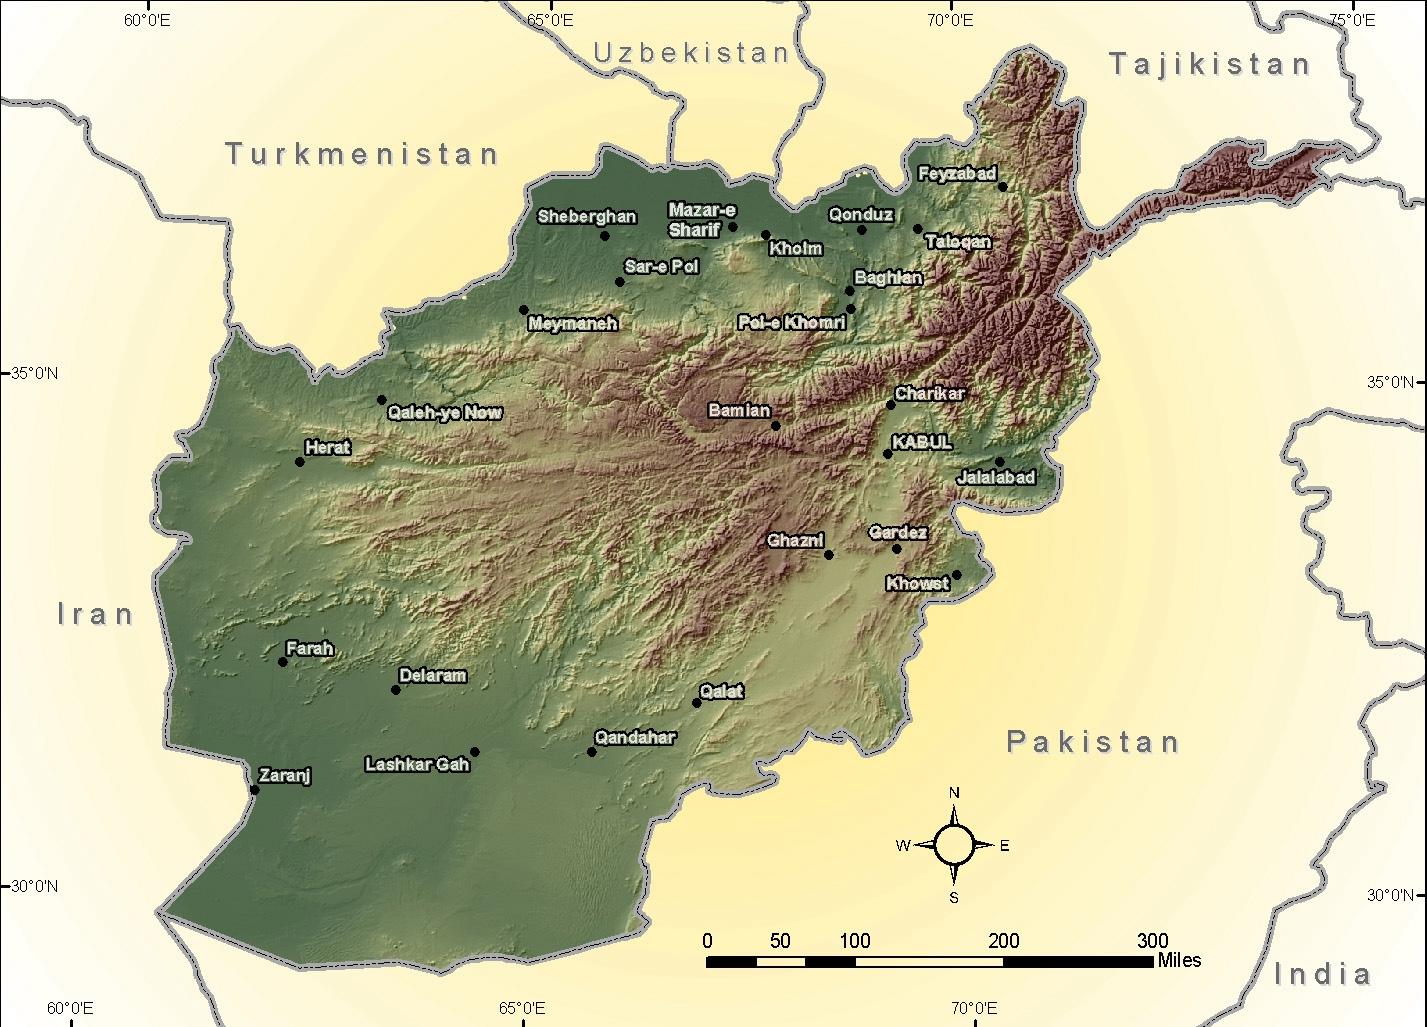 afghanistanreliefmap